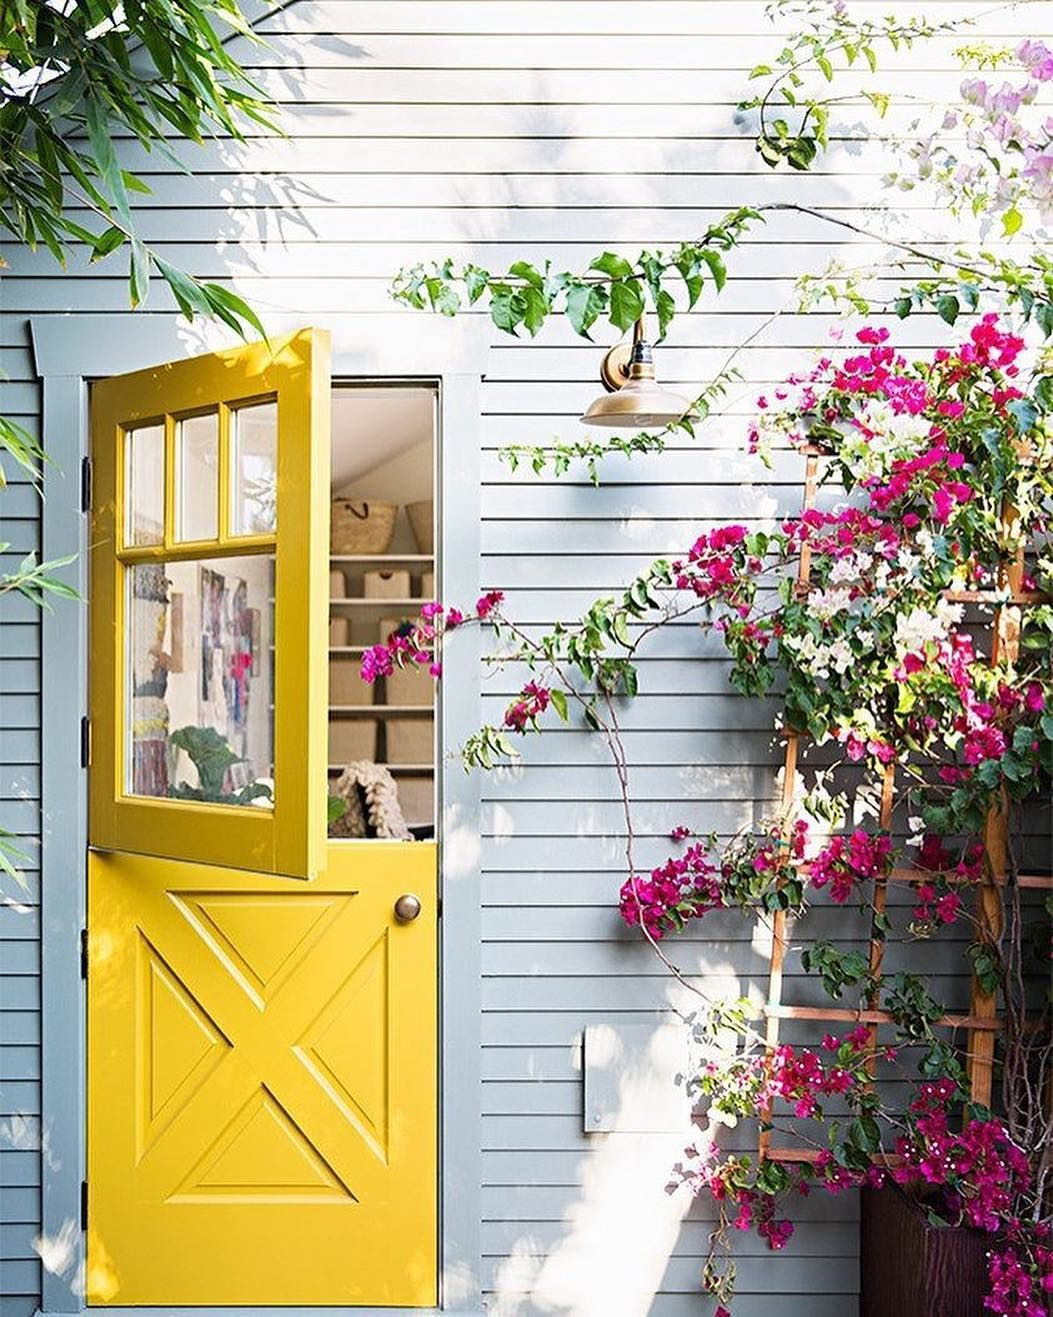 Pin by ashlyn richter on dream house pinterest doors hallway